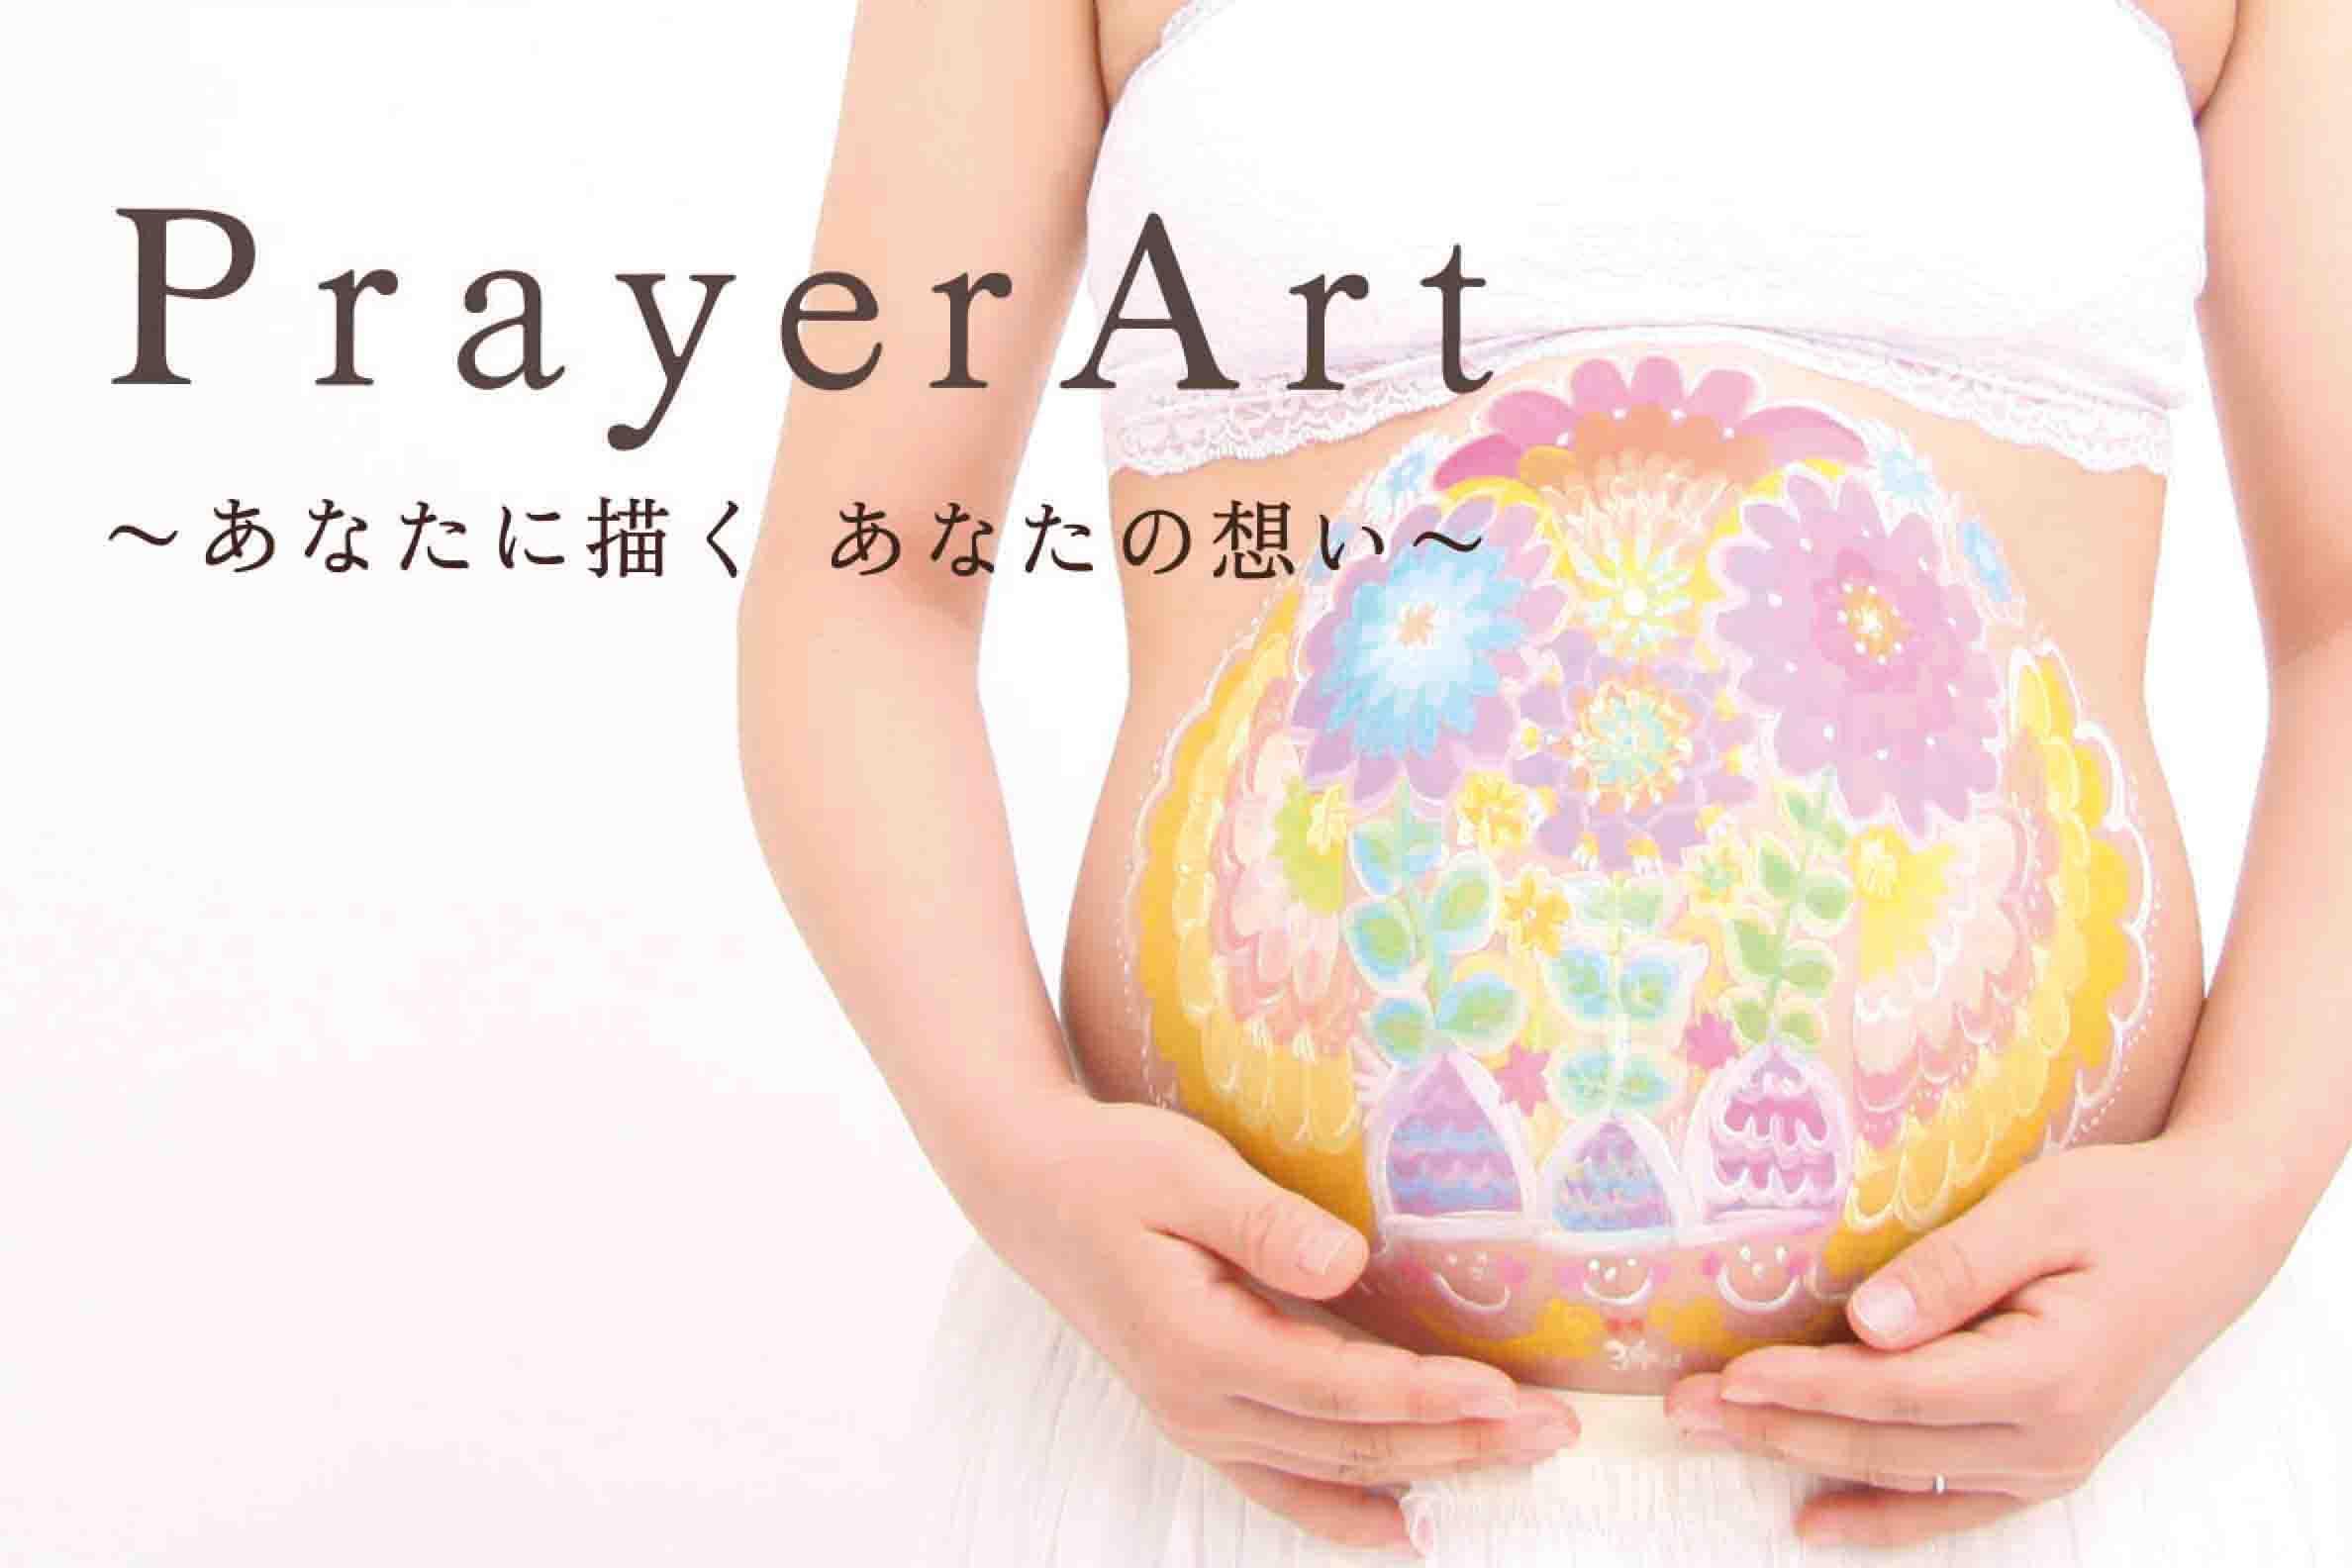 PrayerArt【マタニティペイント】